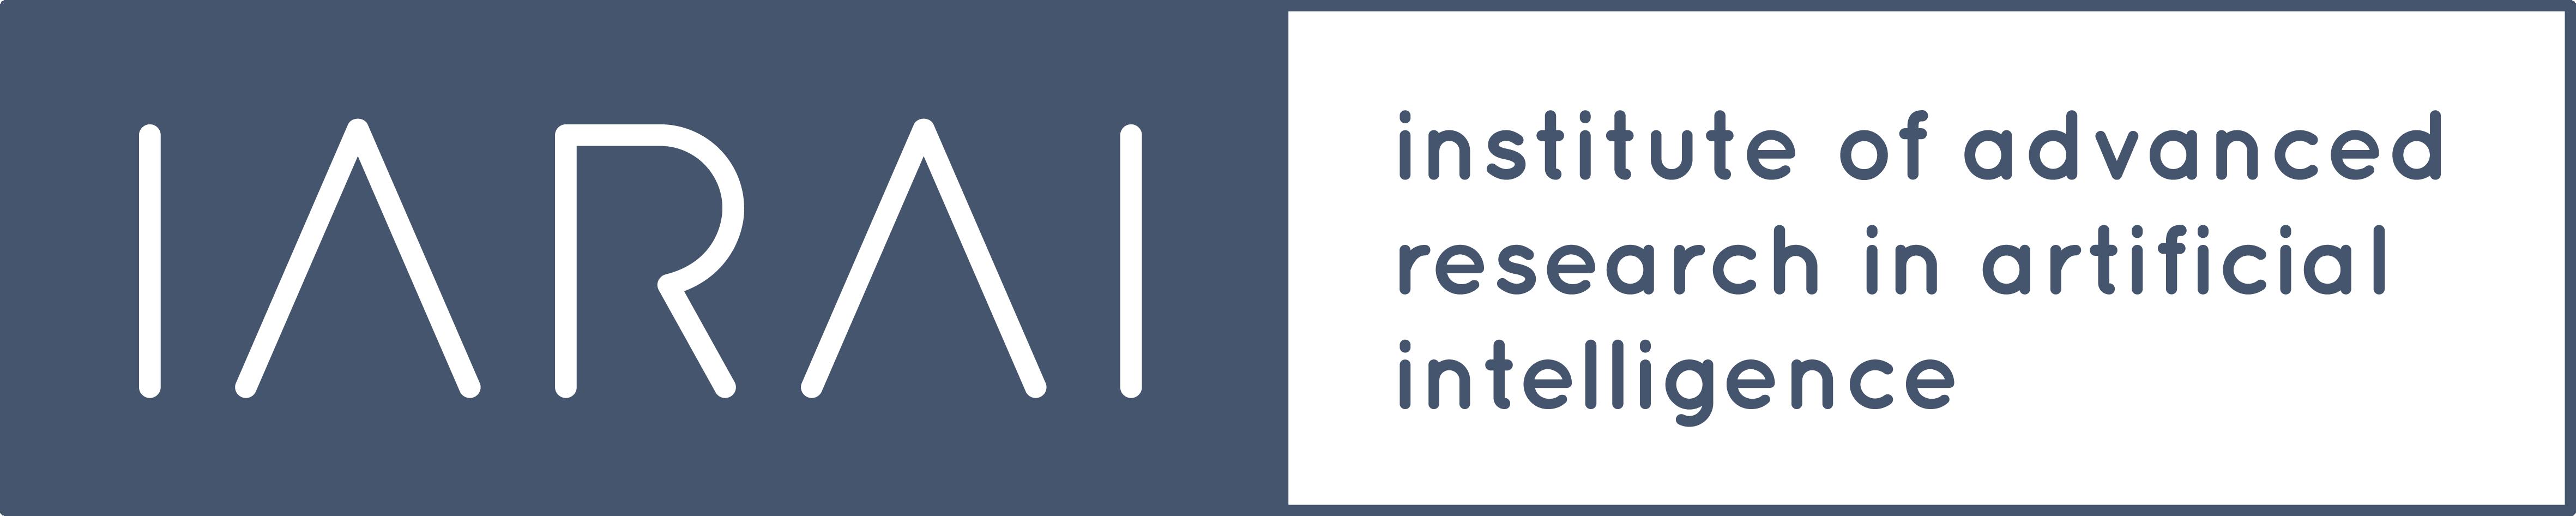 IARAI, Institute of advanced research in artificial intelligence